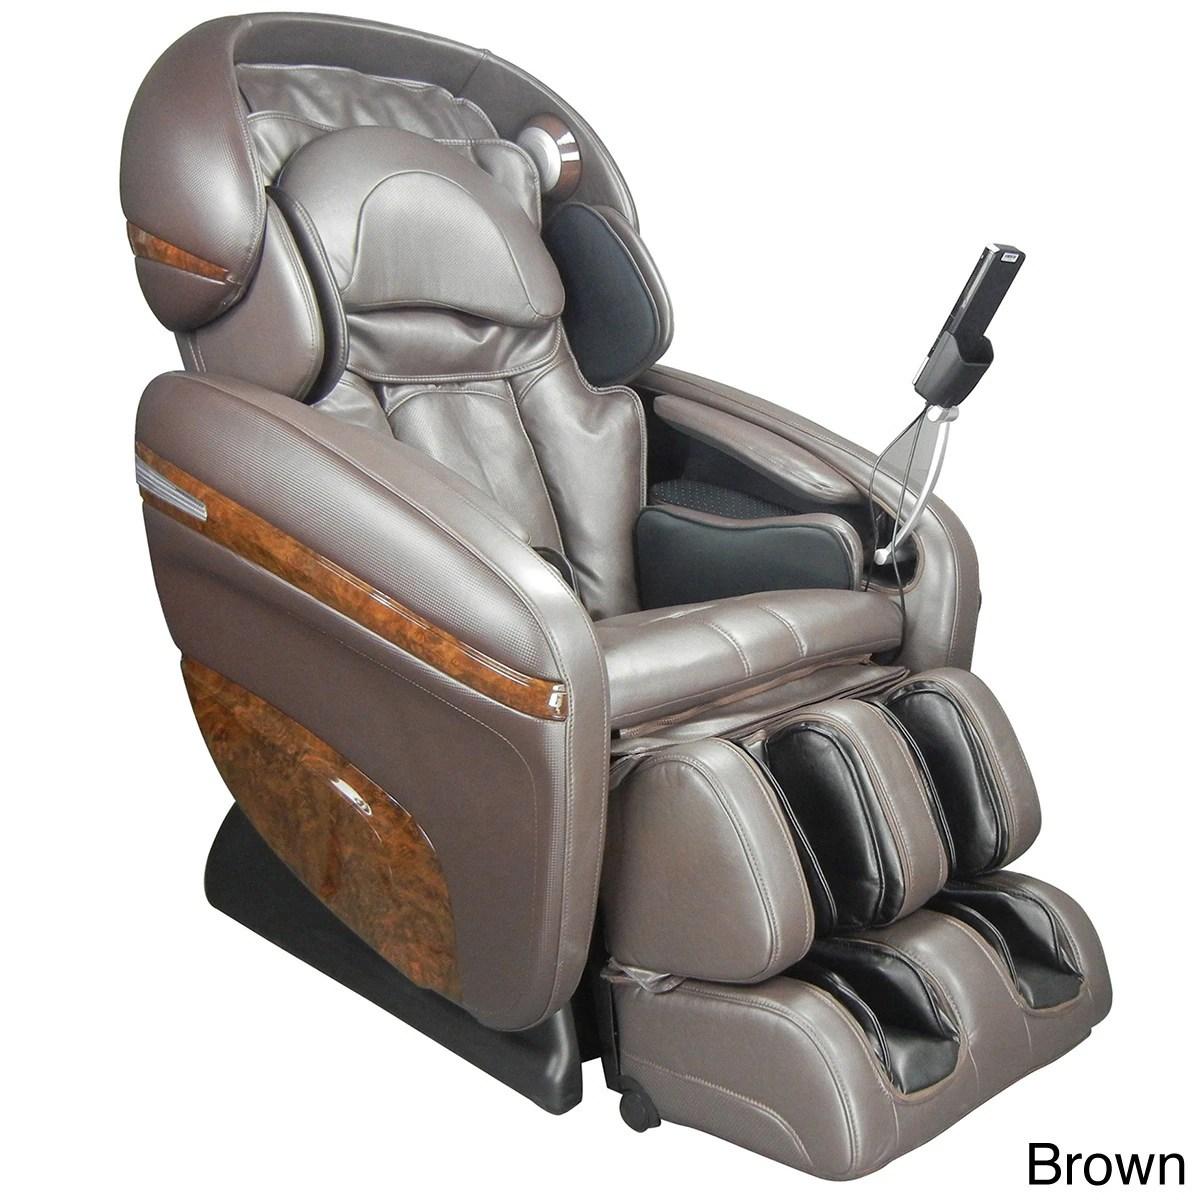 used brookstone massage chair cover rentals timmins osaki craigslist 2 awesome osaka